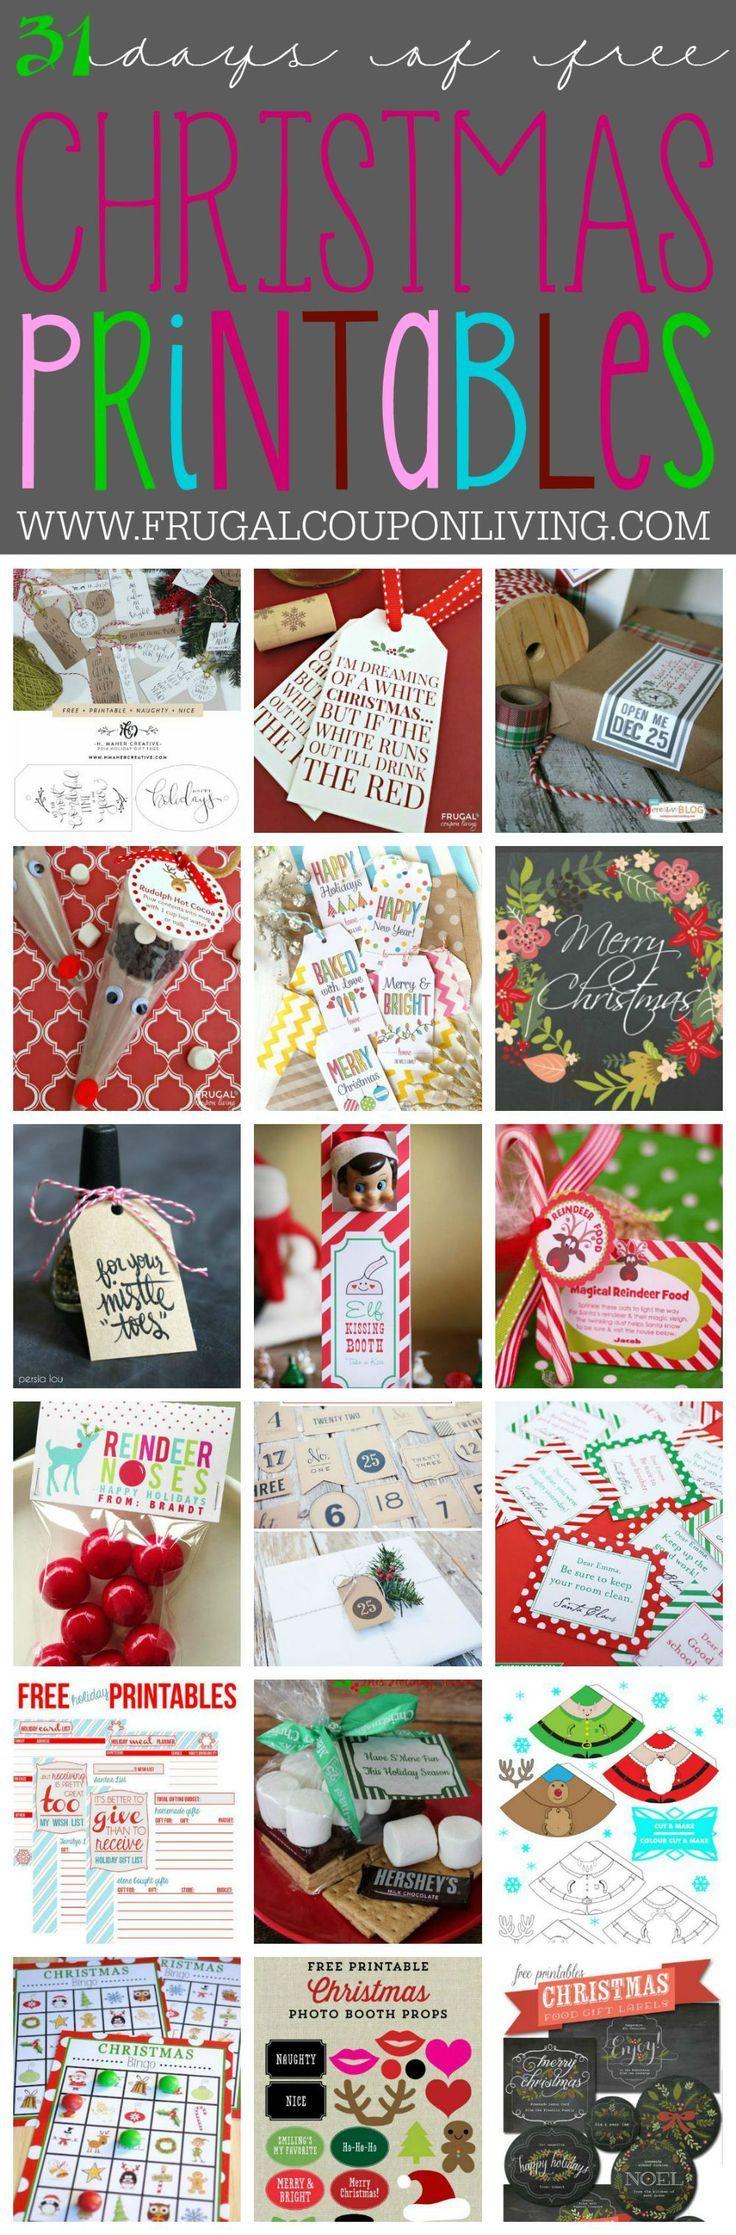 31 days of Free Christmas Printables on Frugal Coupon Living. You can jingle all...